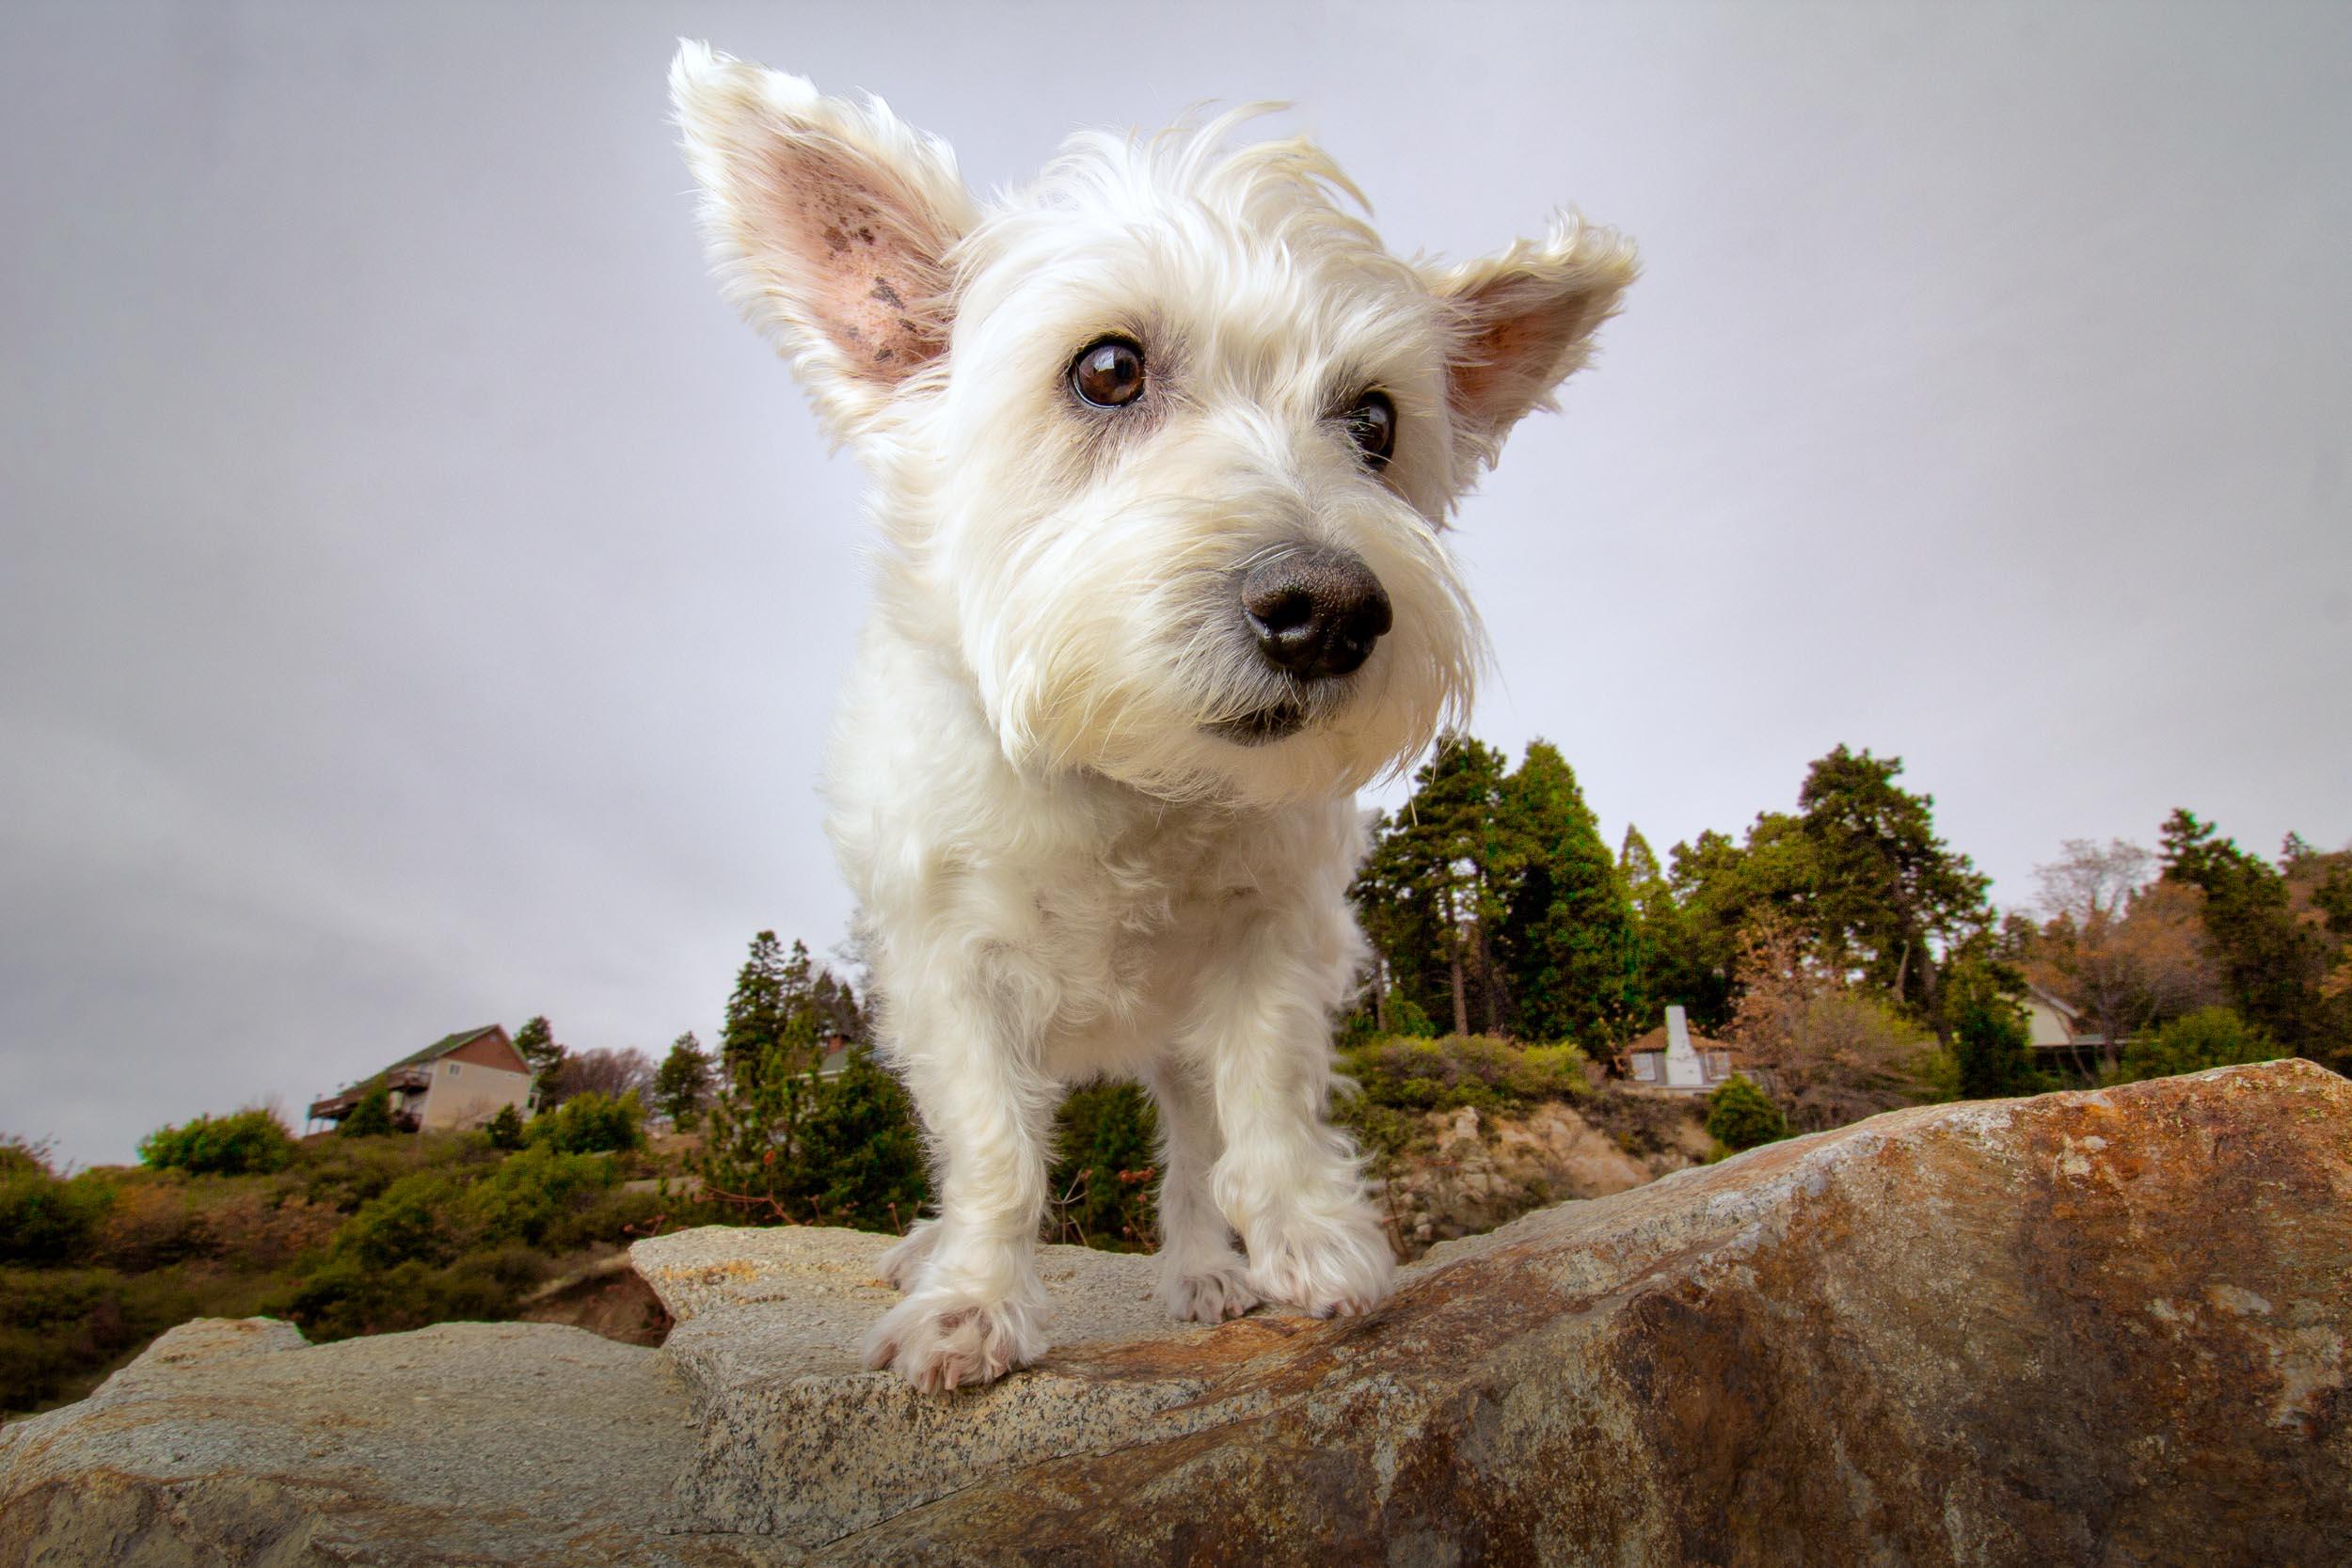 22-Orange-County-Dog-Photographer-Southern-California-Steamer-Lee.JPG